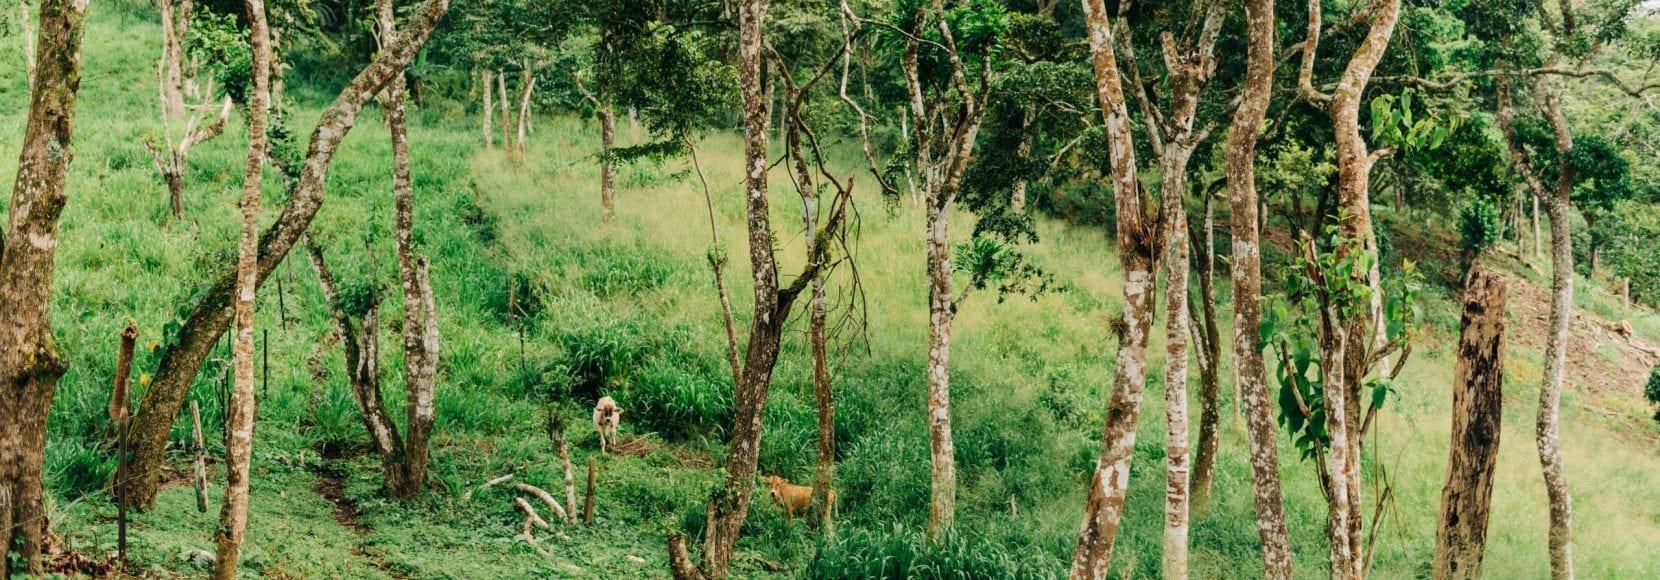 Landscape of trees on mountainside